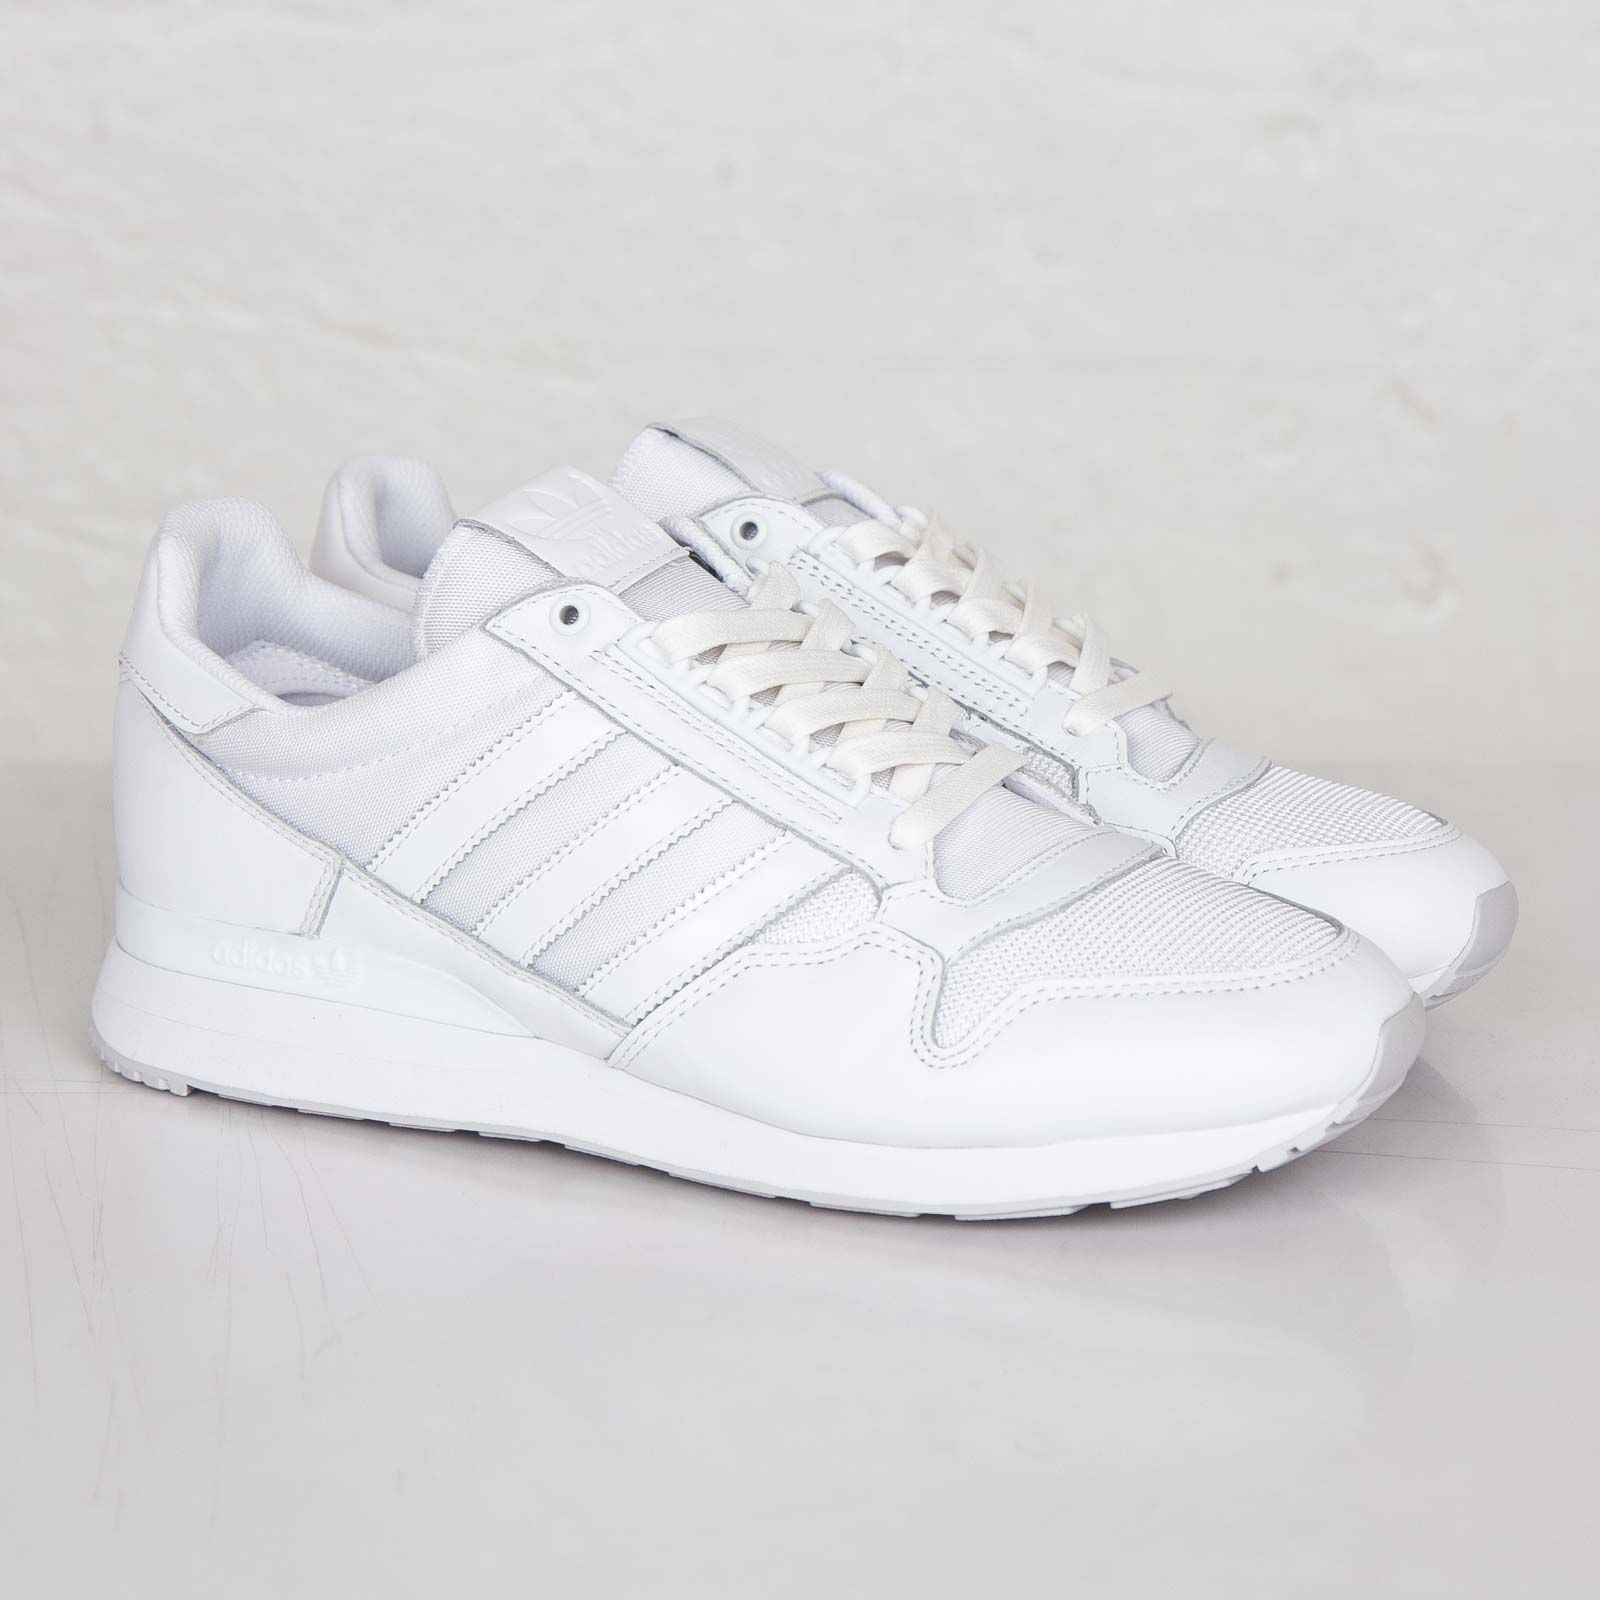 Zx Adidas Blancas